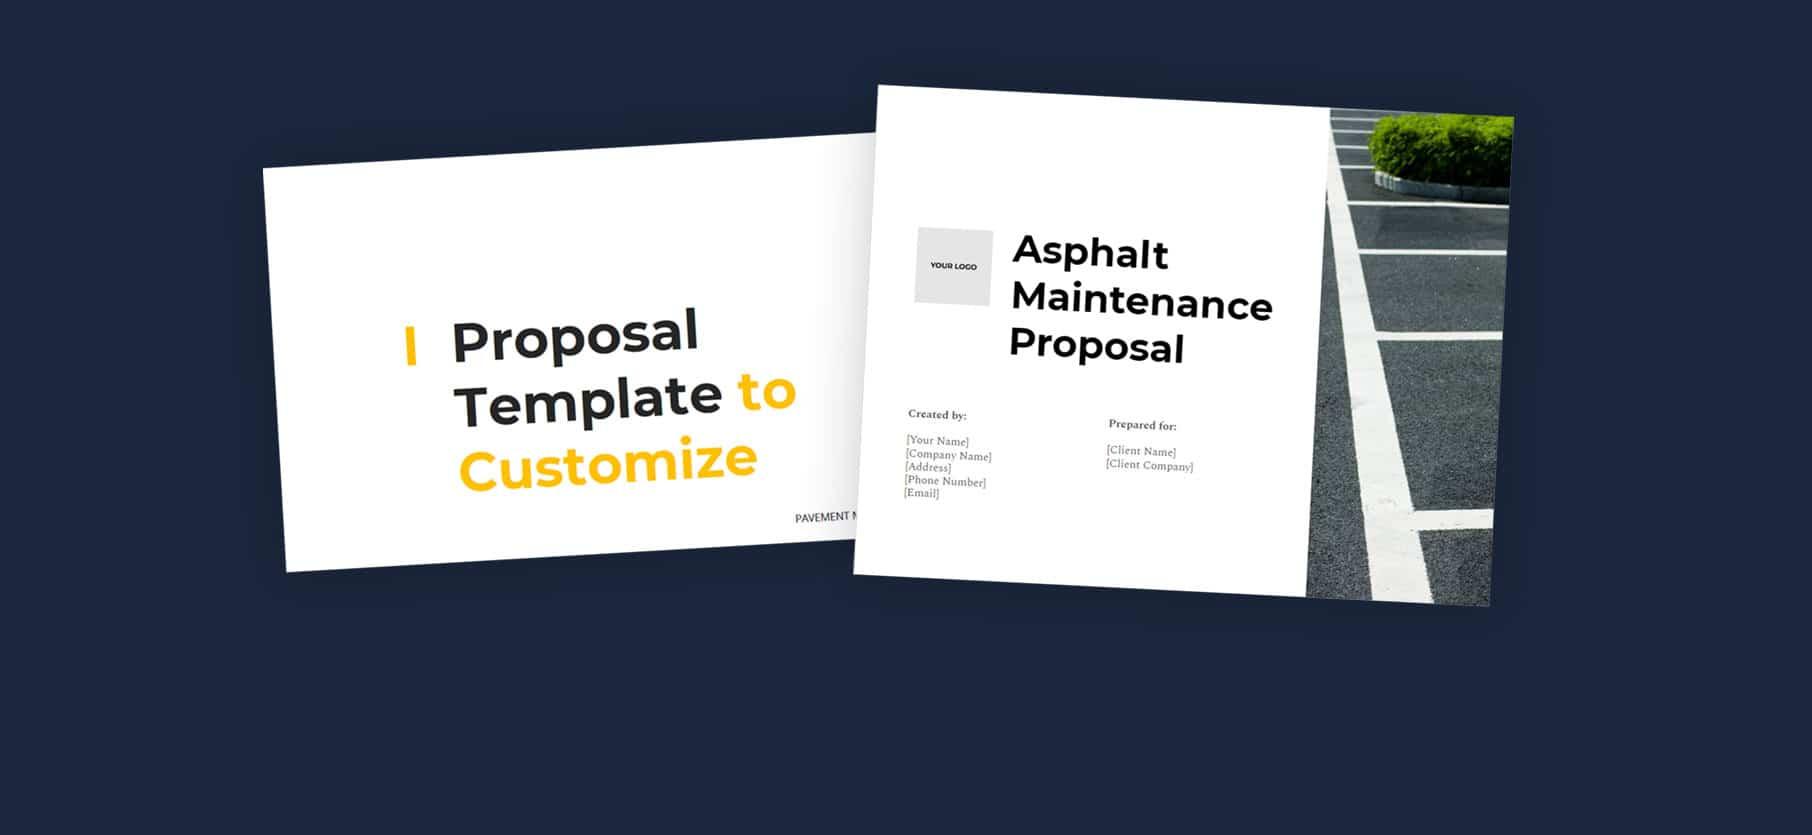 I Proposal Template to Customize for Asphalt Maintenance Proposal